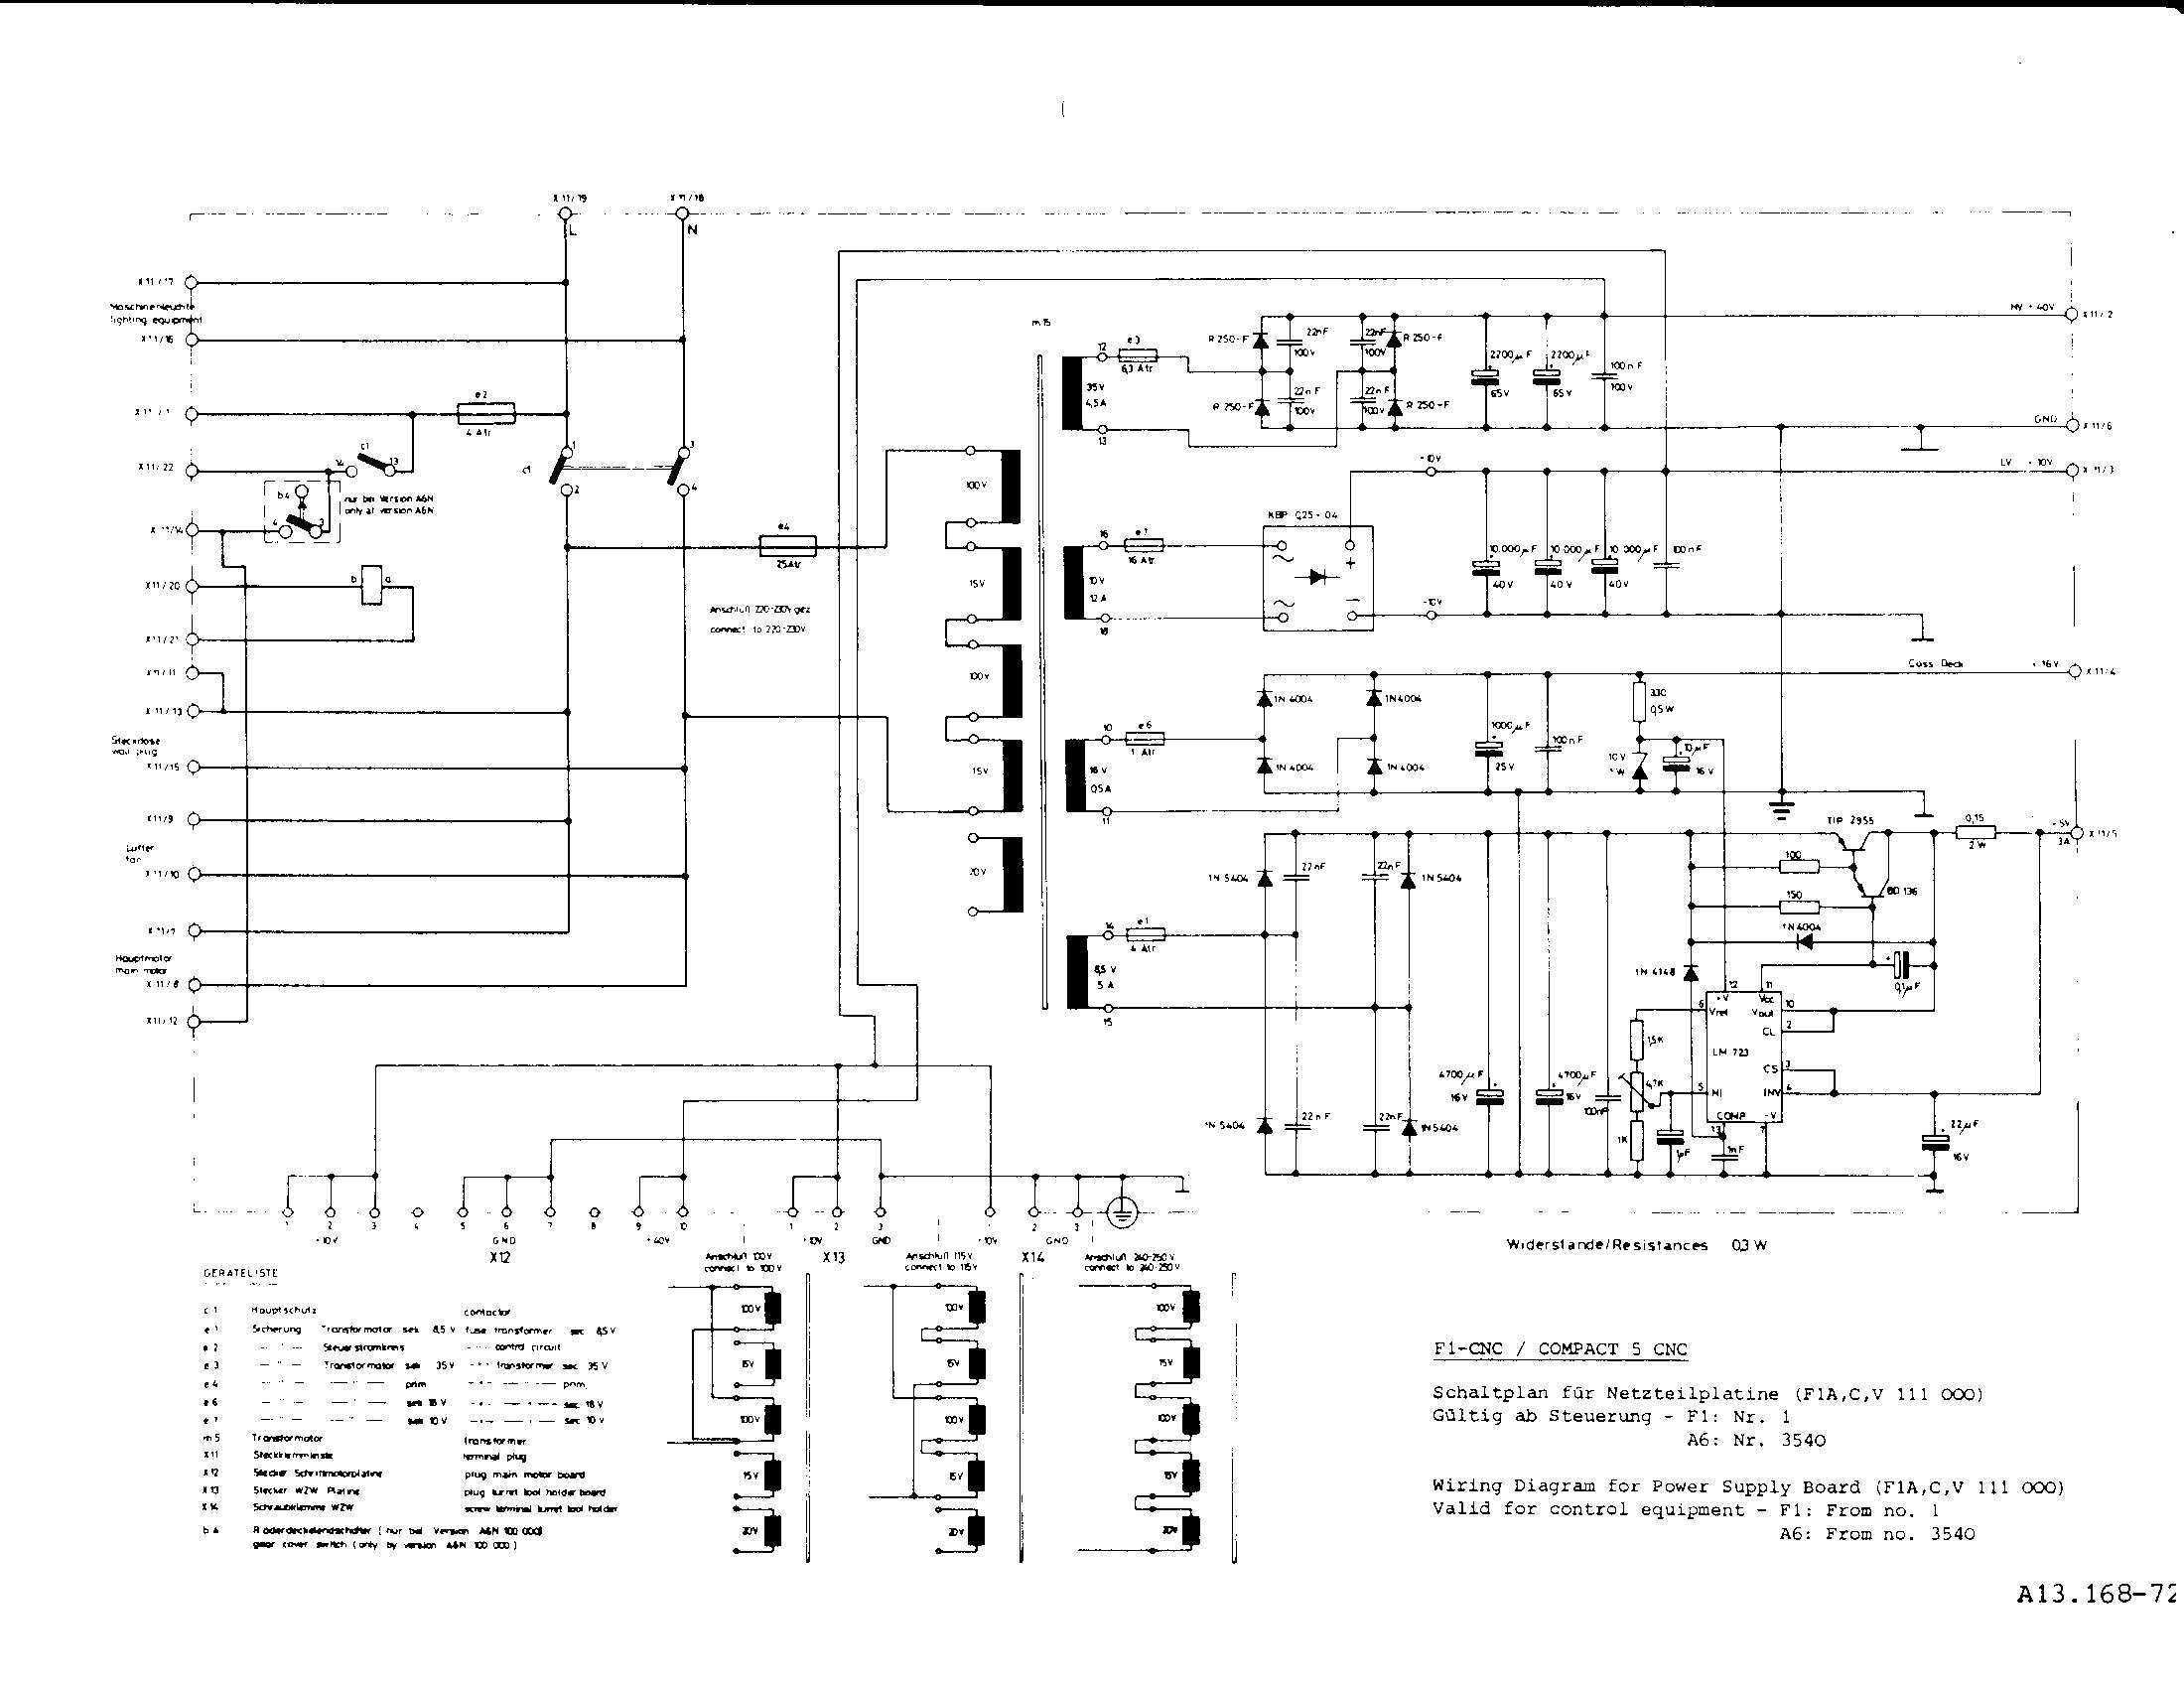 emco compact 5 cnc Cnc20510